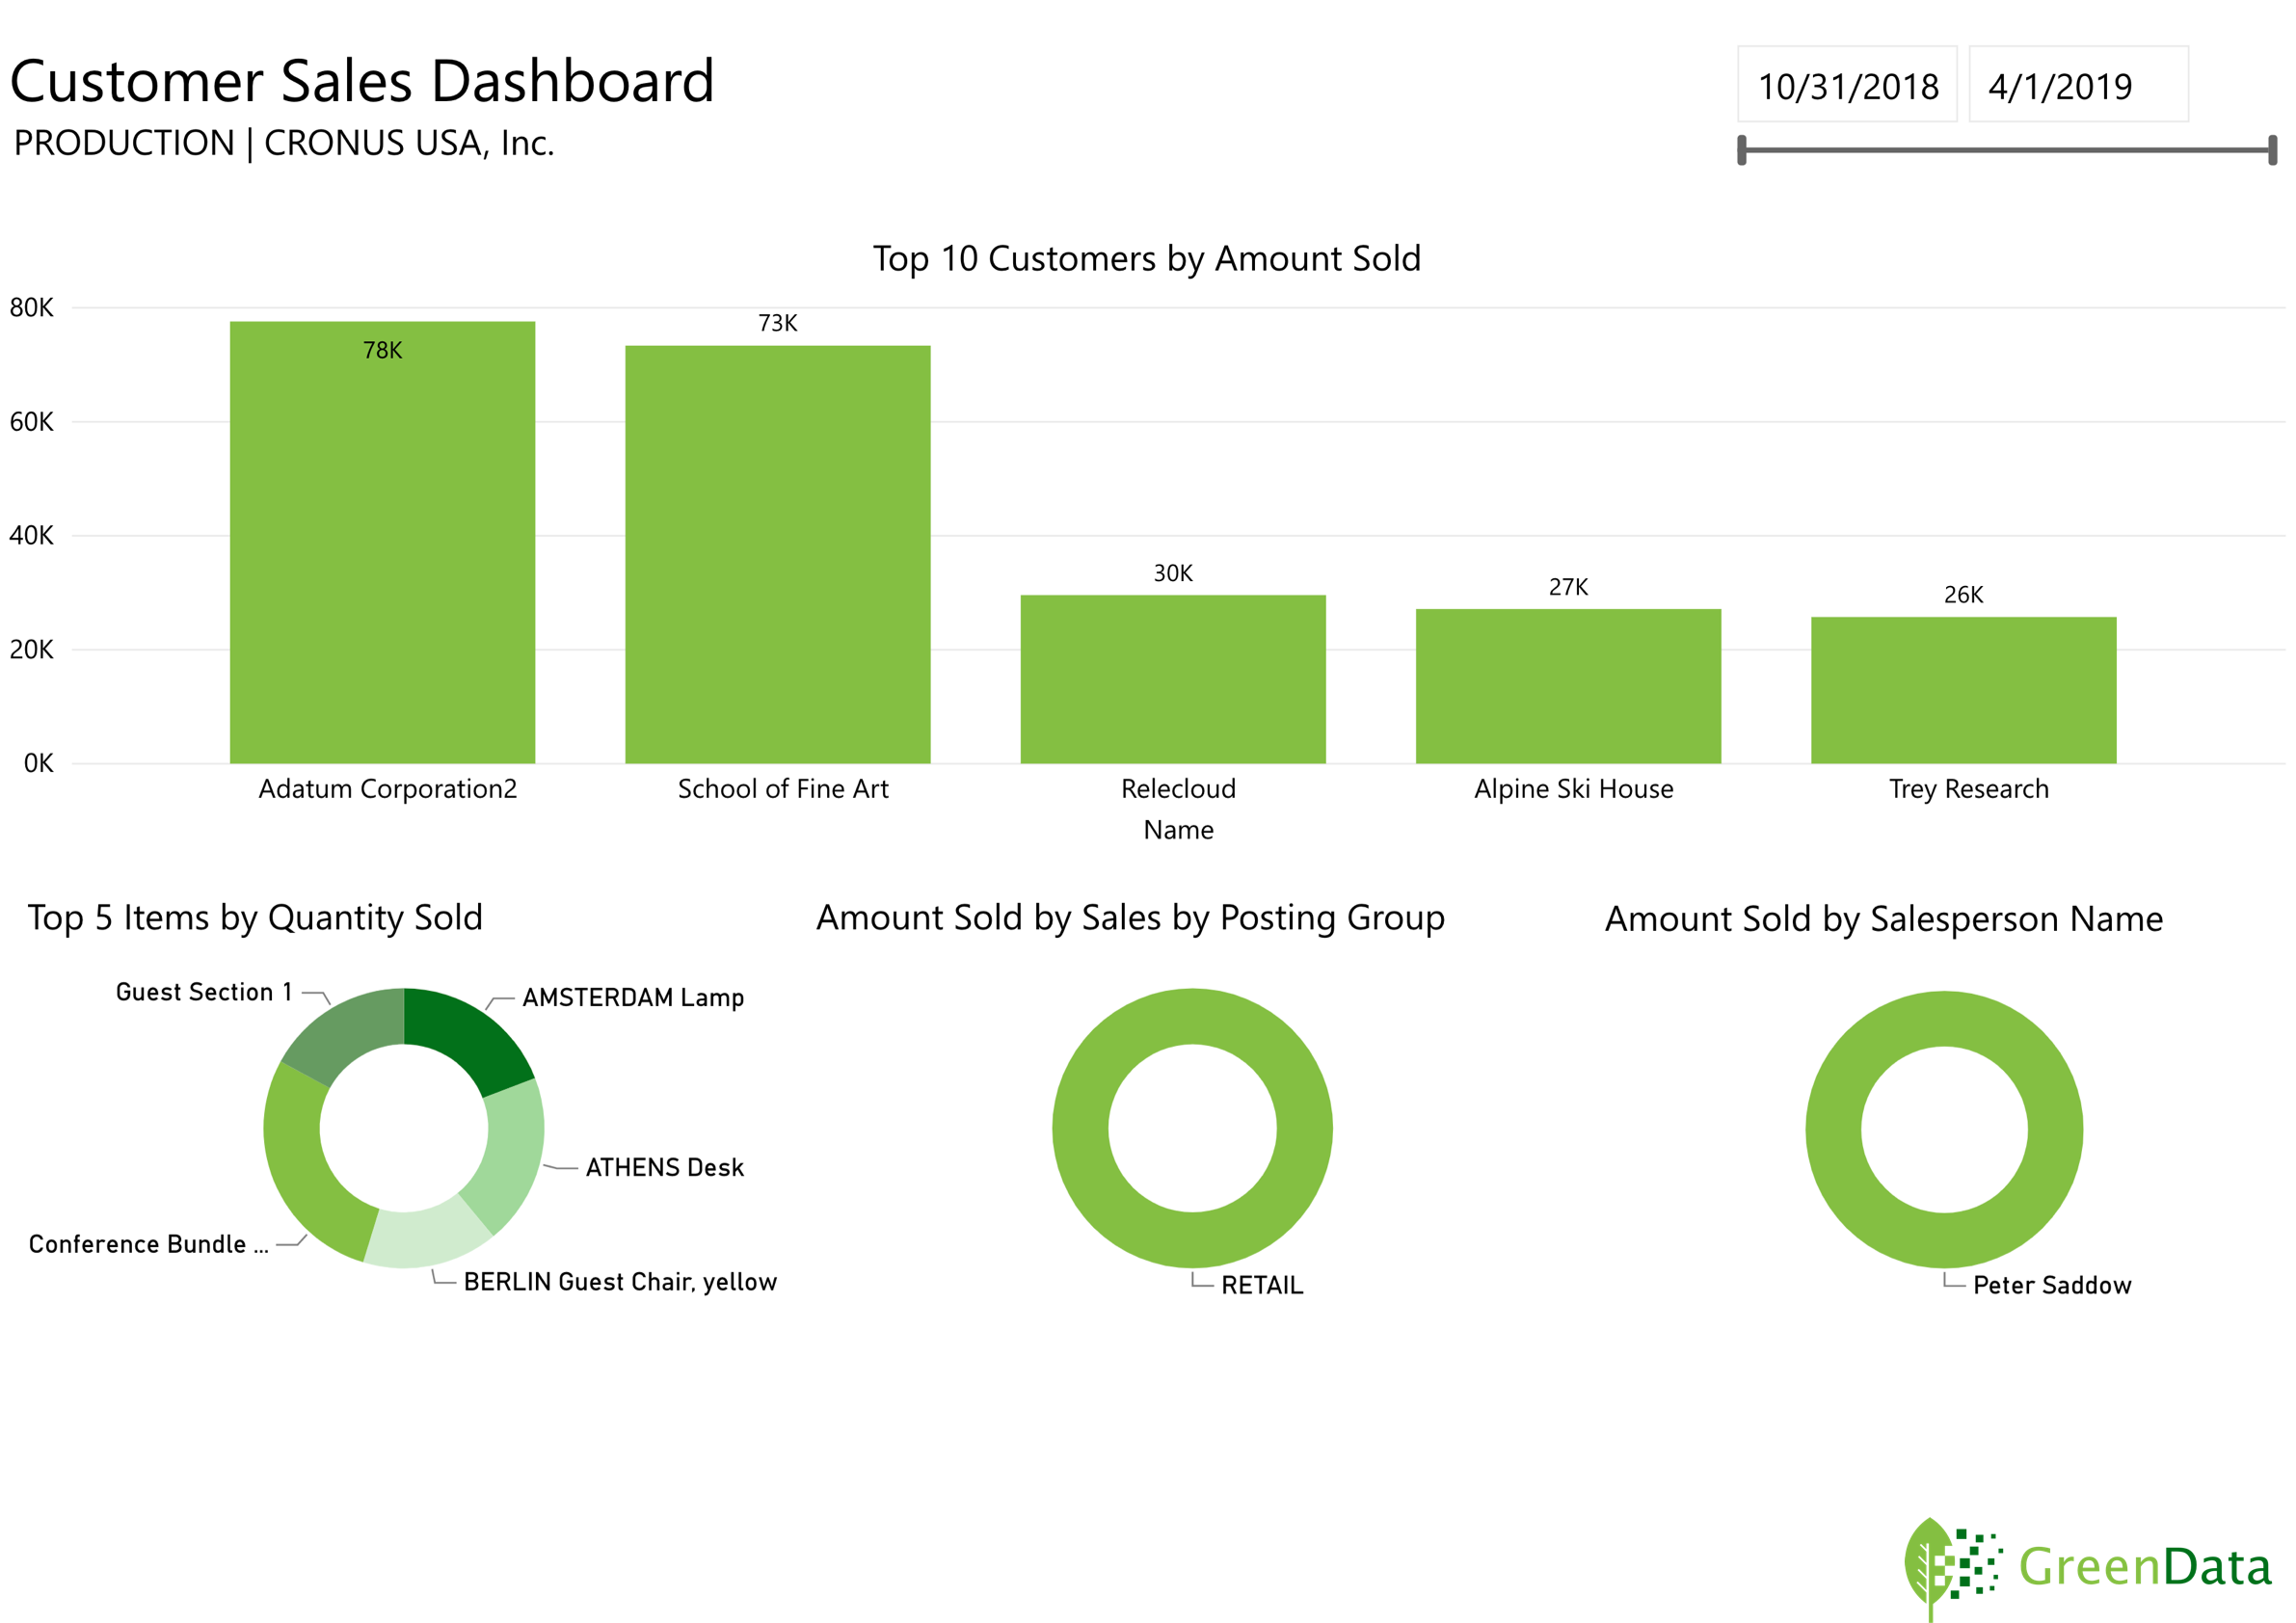 GreenData.io | Microsoft Dynamics 365 Customer Sales Dashboard